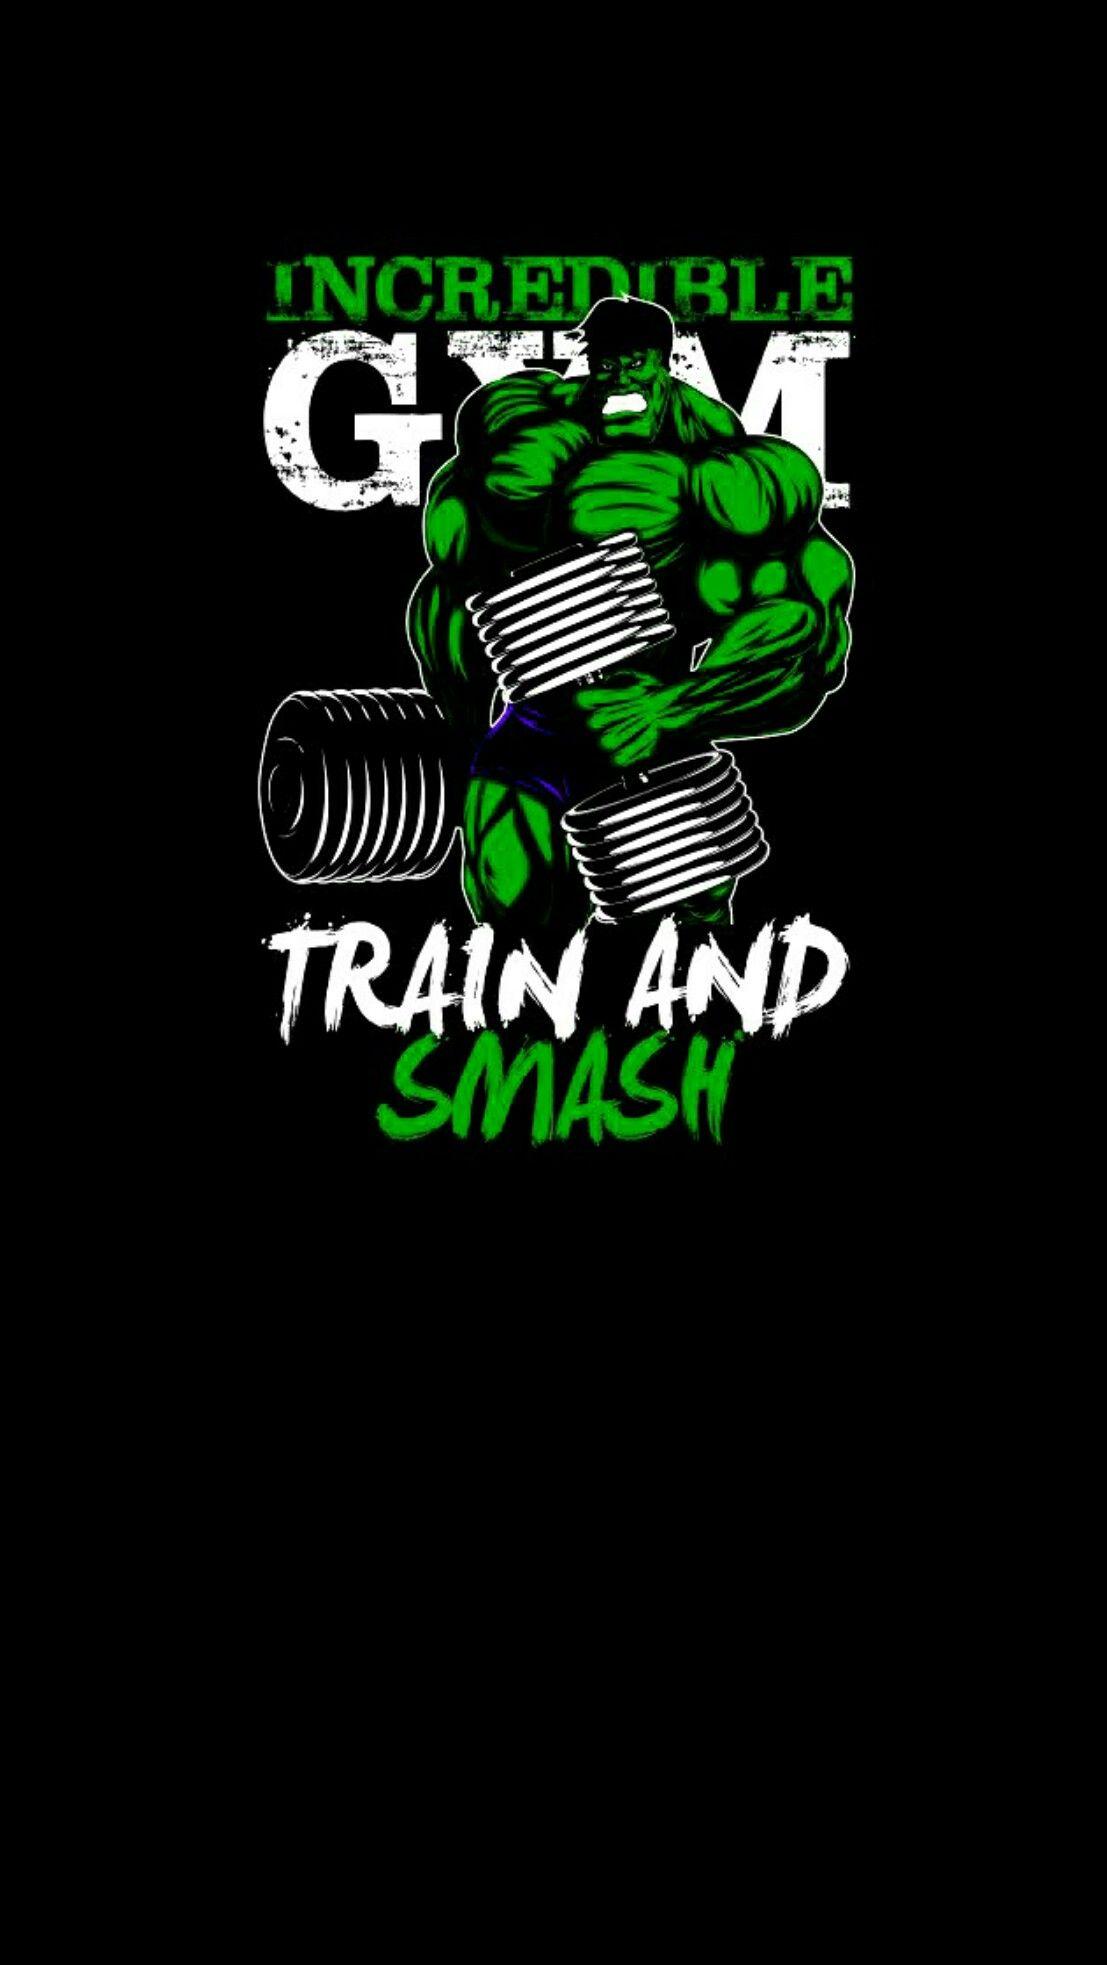 Anime Hulk Black Wallpaper Android Iphone Gym Art Gym Wallpaper Bodybuilding Logo